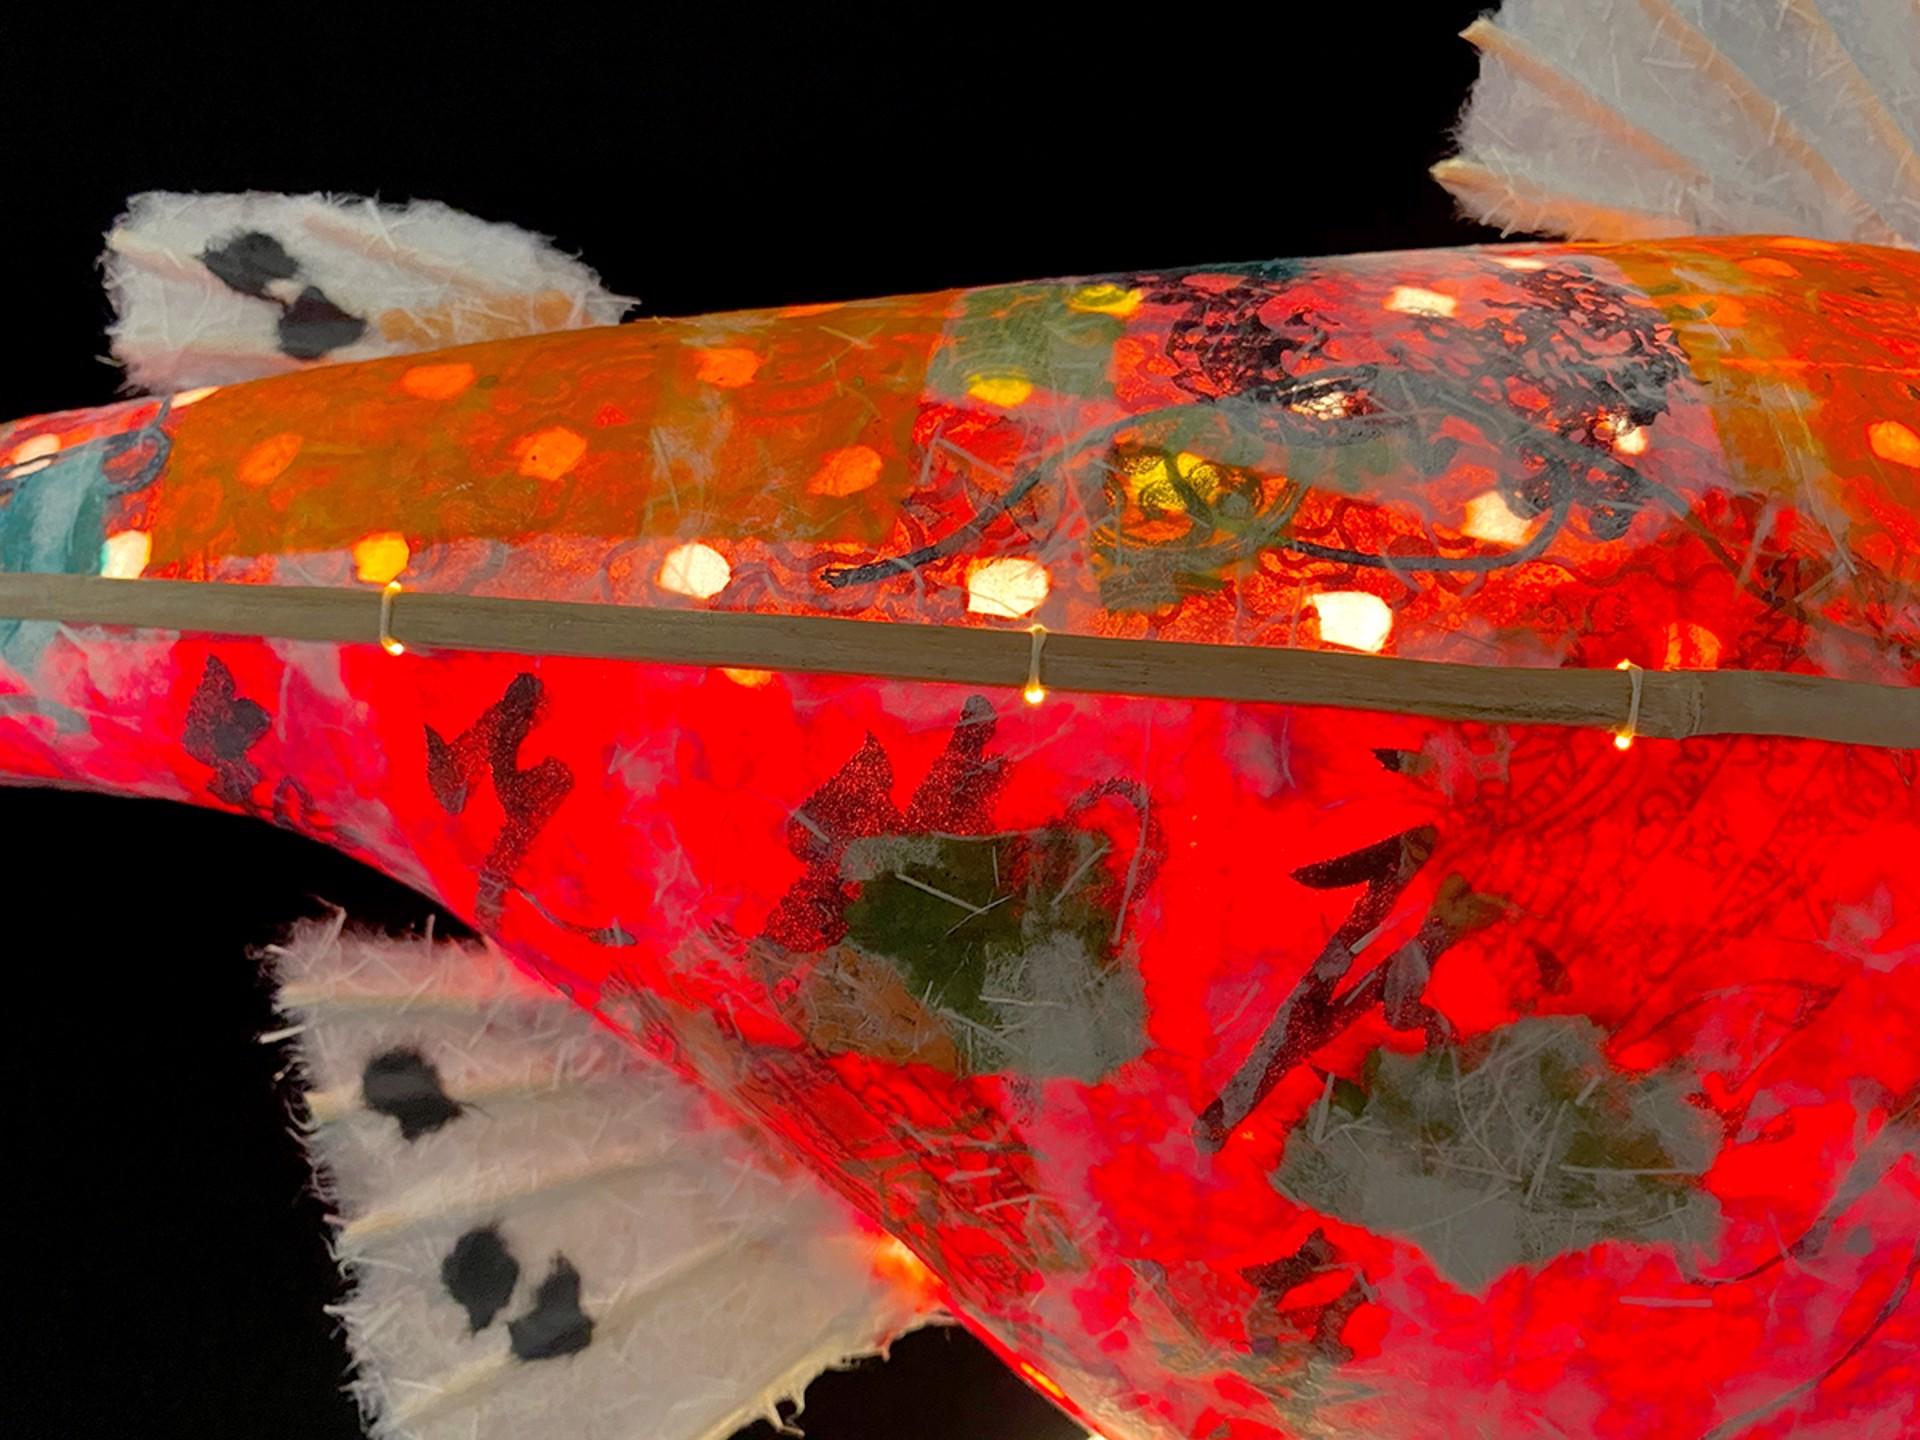 Deep Red Saffron Salmon by Elaine Hanowell